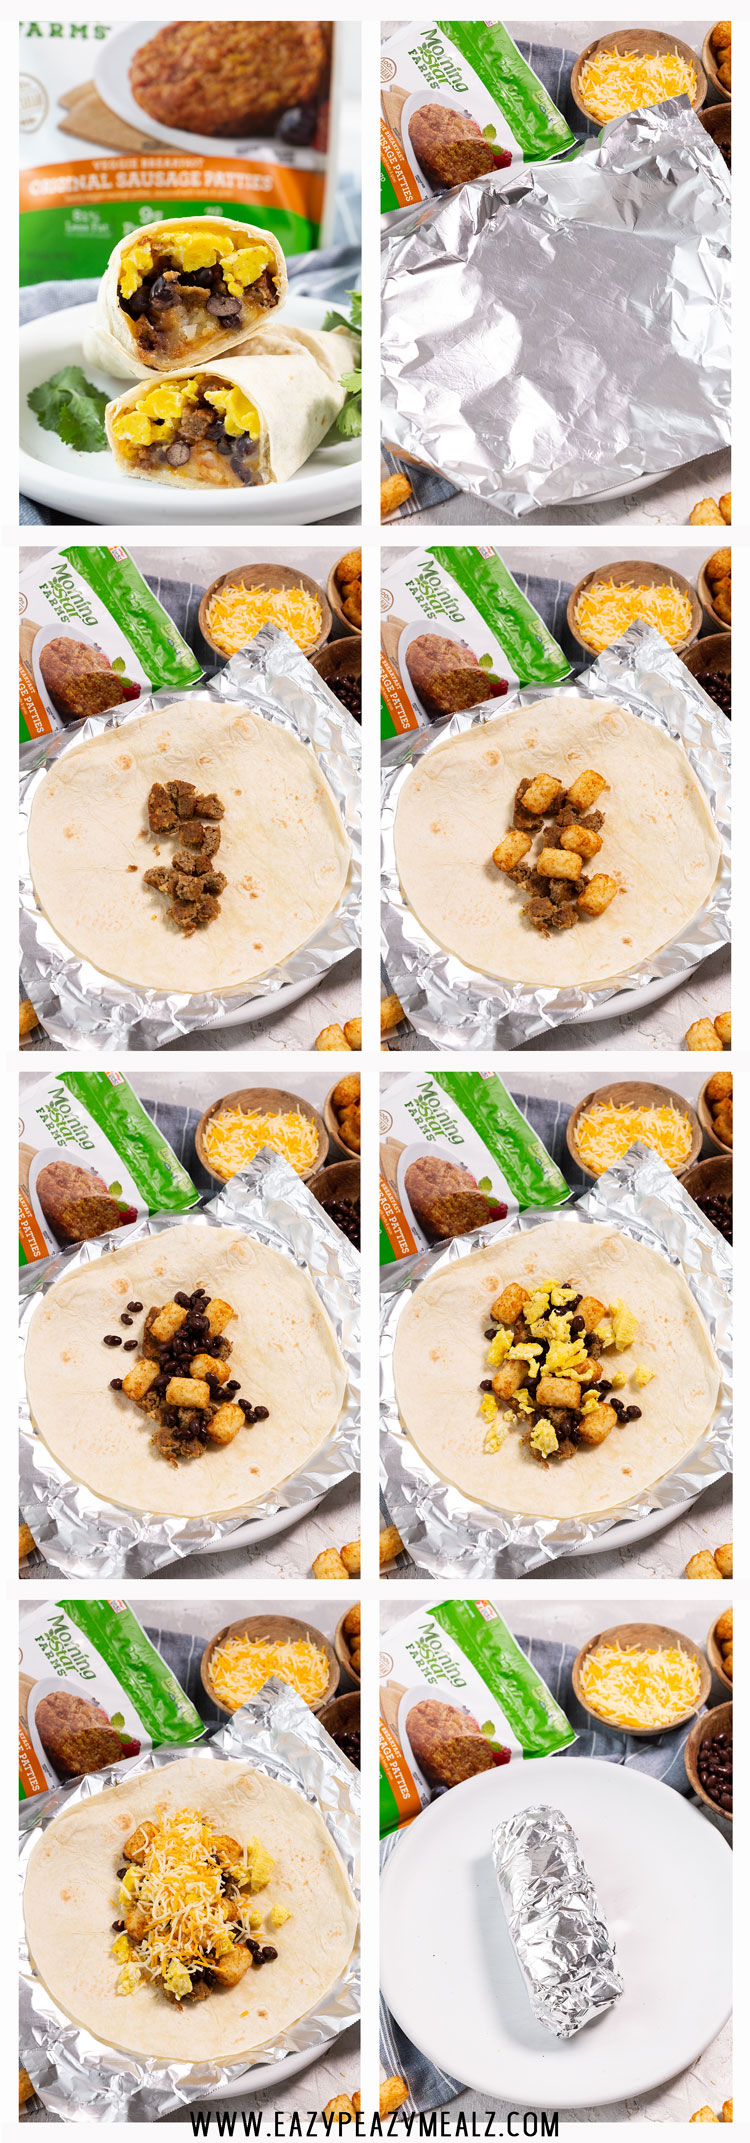 Classic breakfast burrito step by step